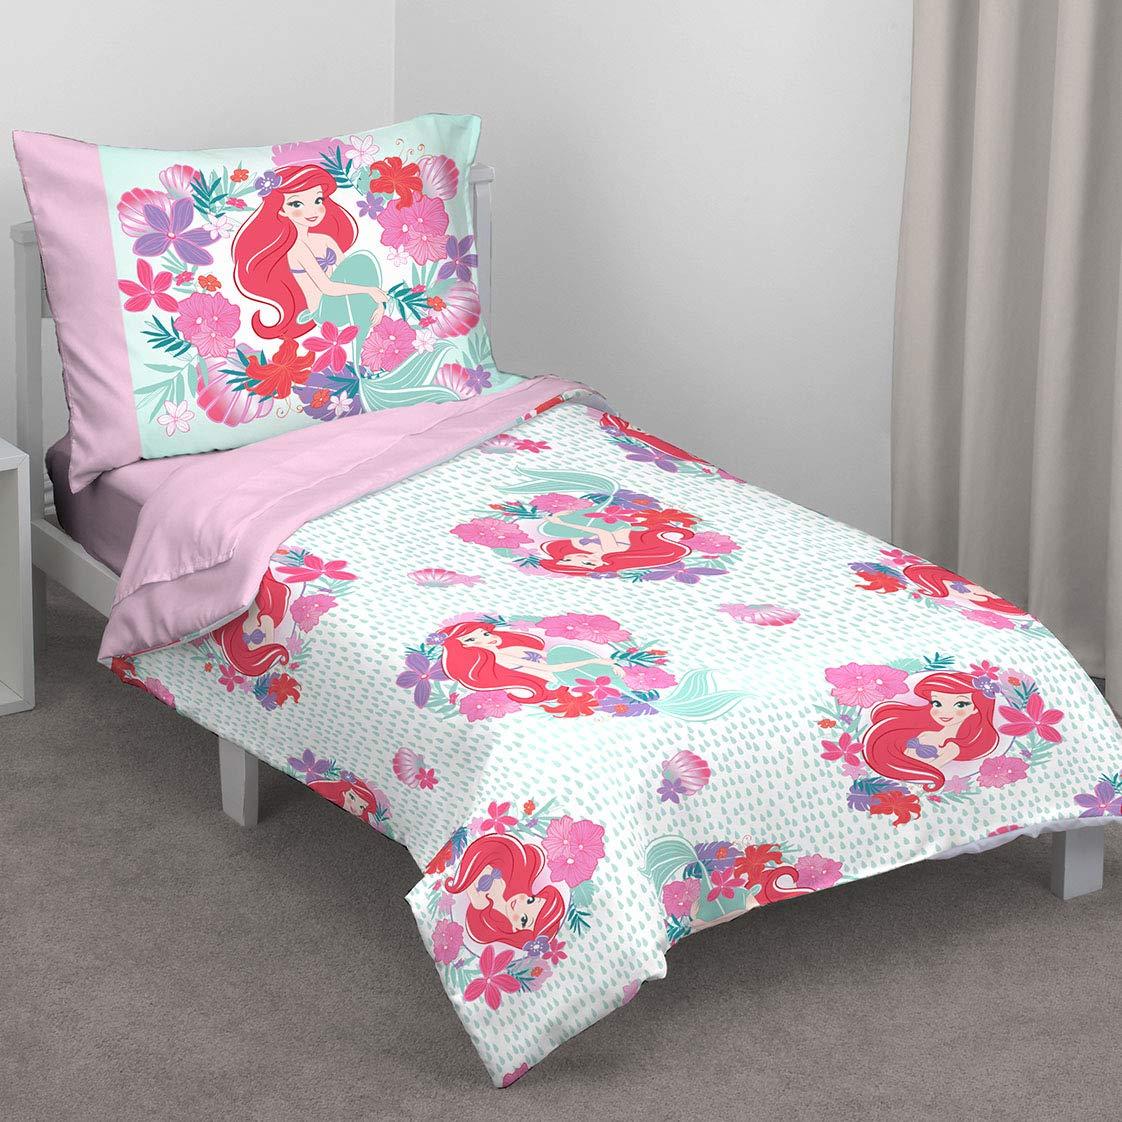 4 Piece Set Pink Crown Crafts Inc 2800416 Disney Pretty Princess Toddler Bed